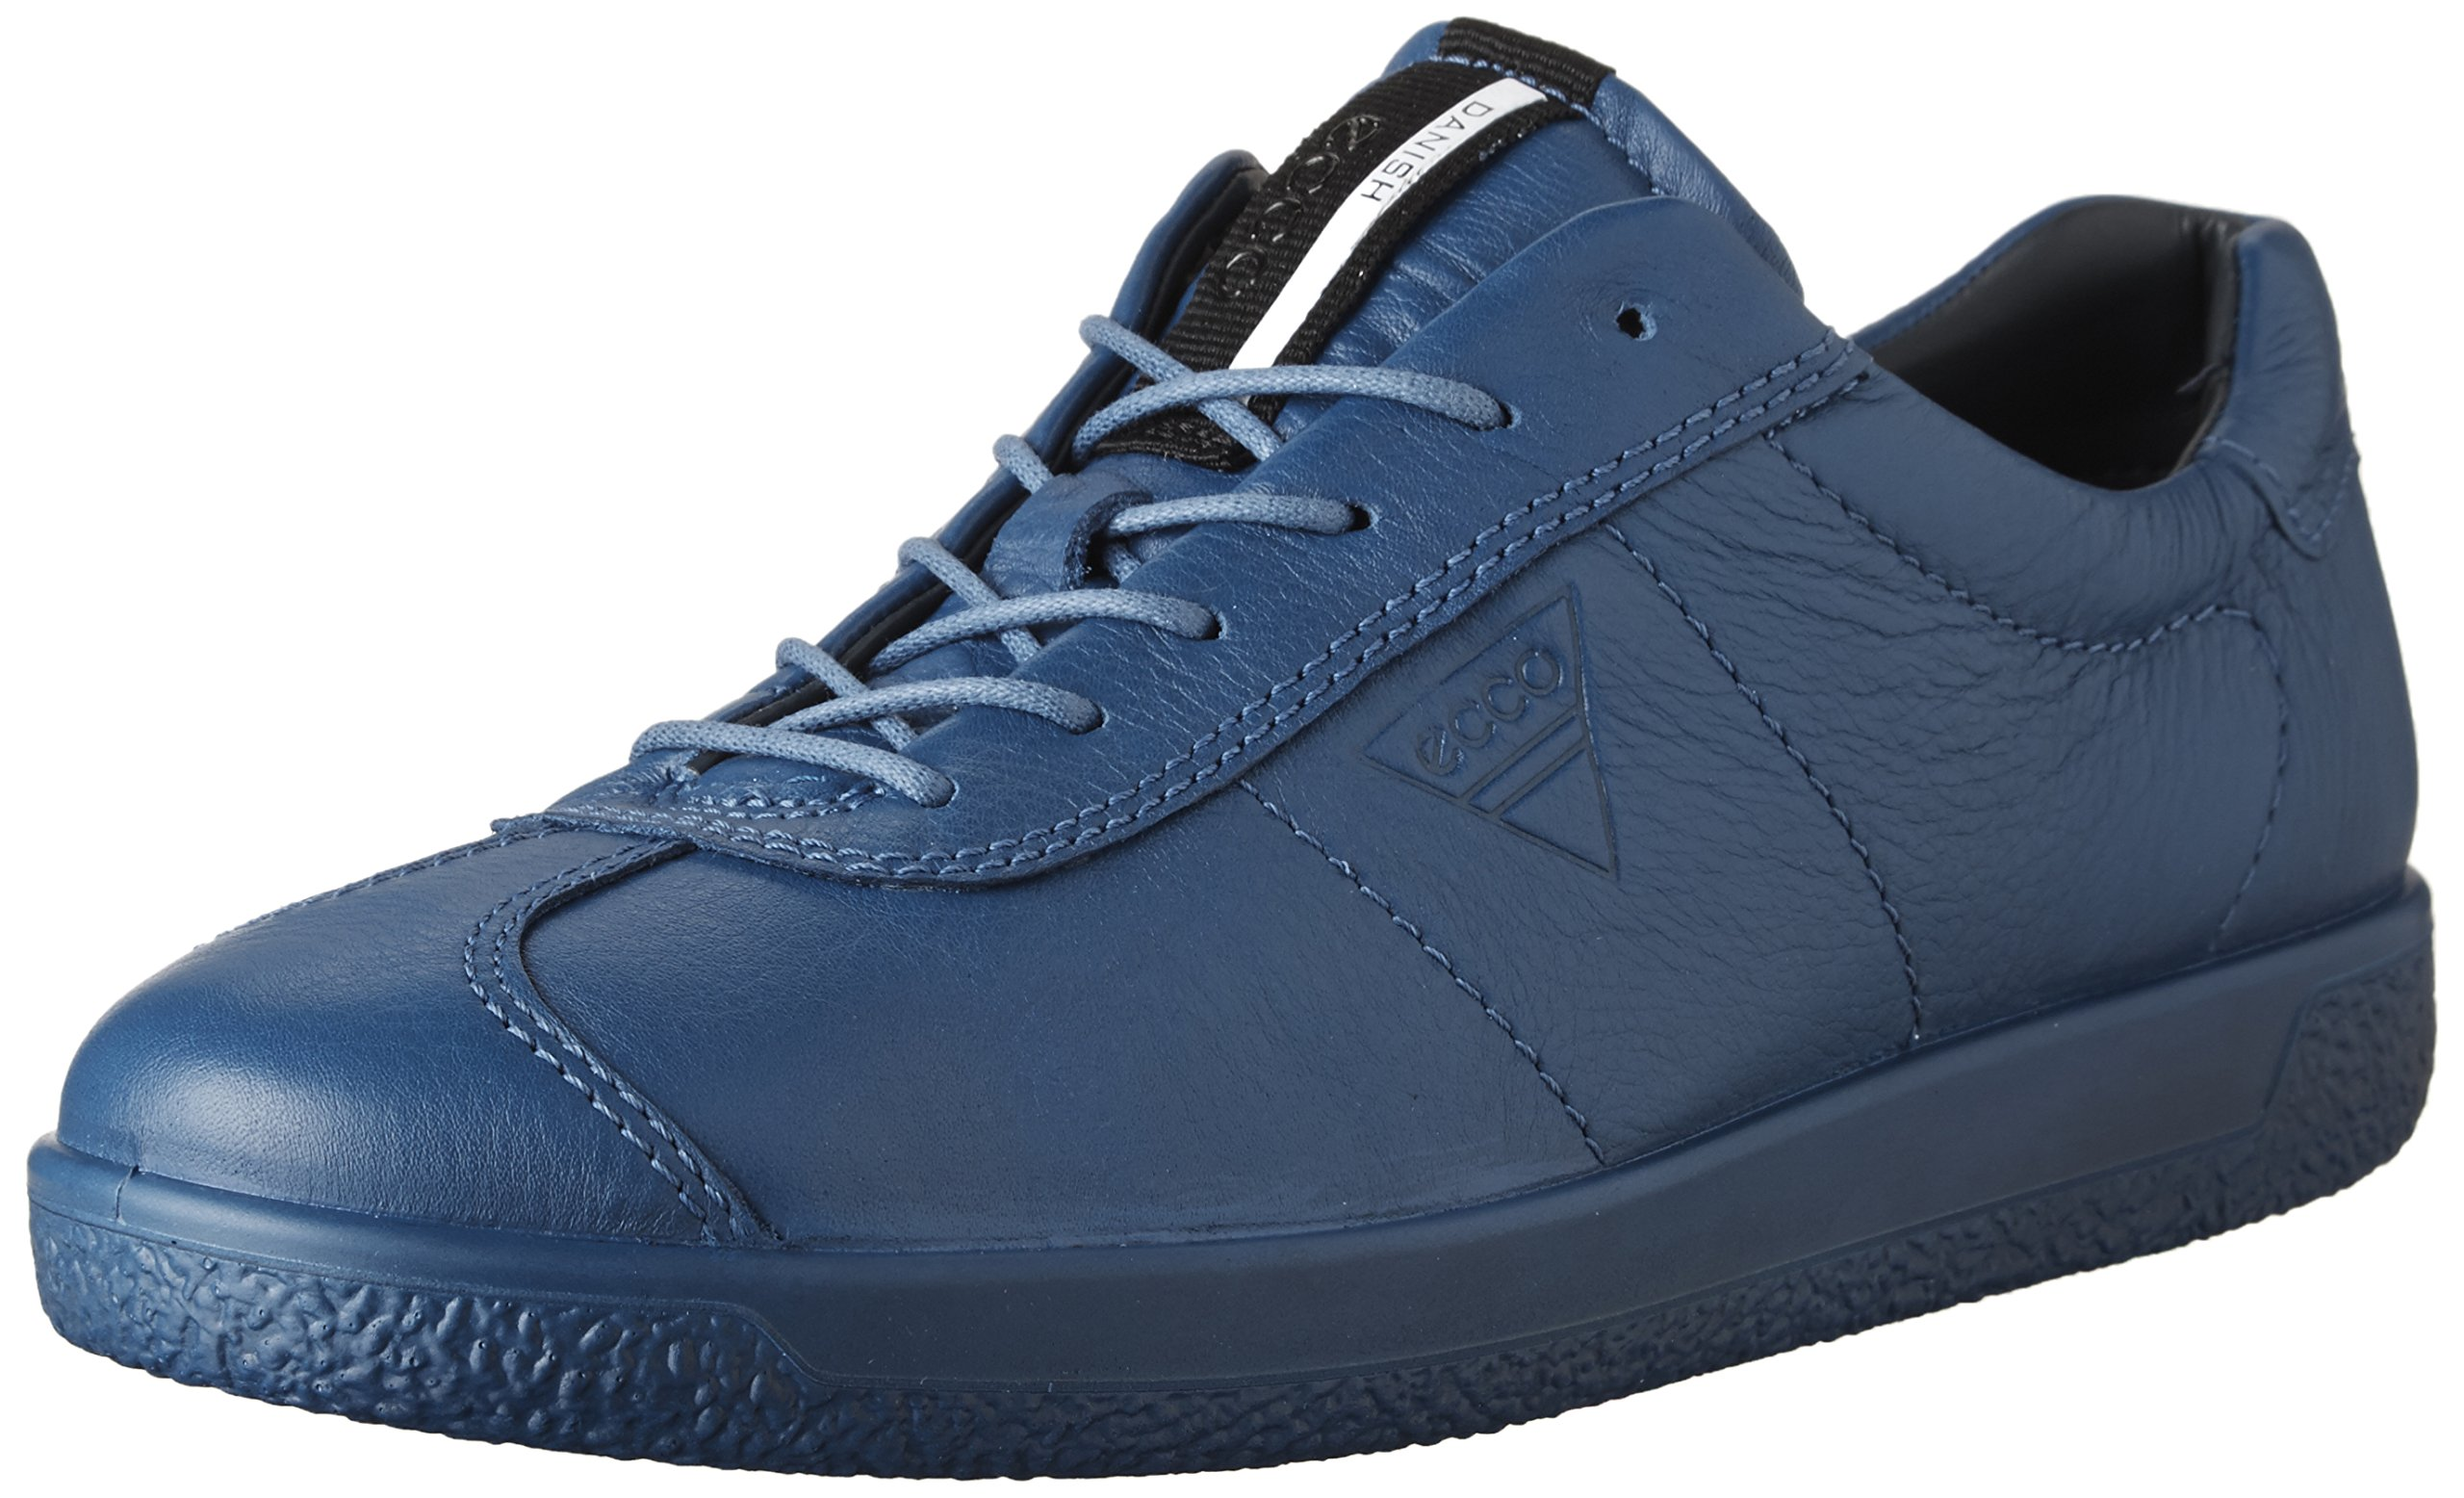 Men'sSneakers 1 Basses Soft HommeBleucobalt44 Eu Ecco T1KJlcF